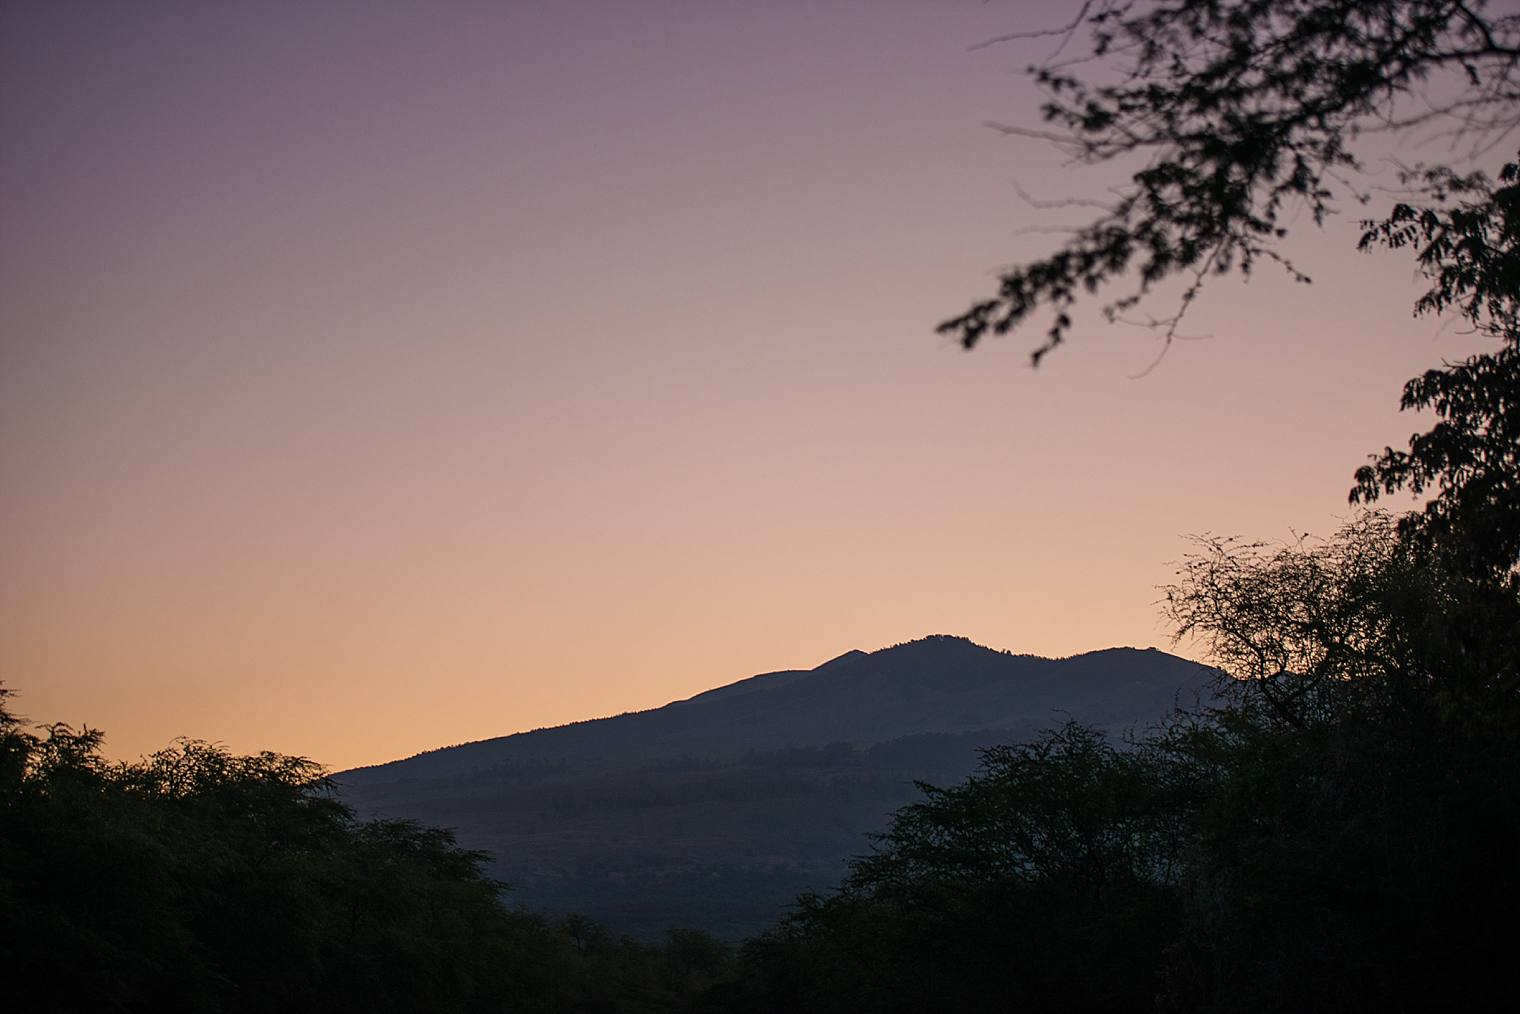 sunrise in makena, maui, hawaii